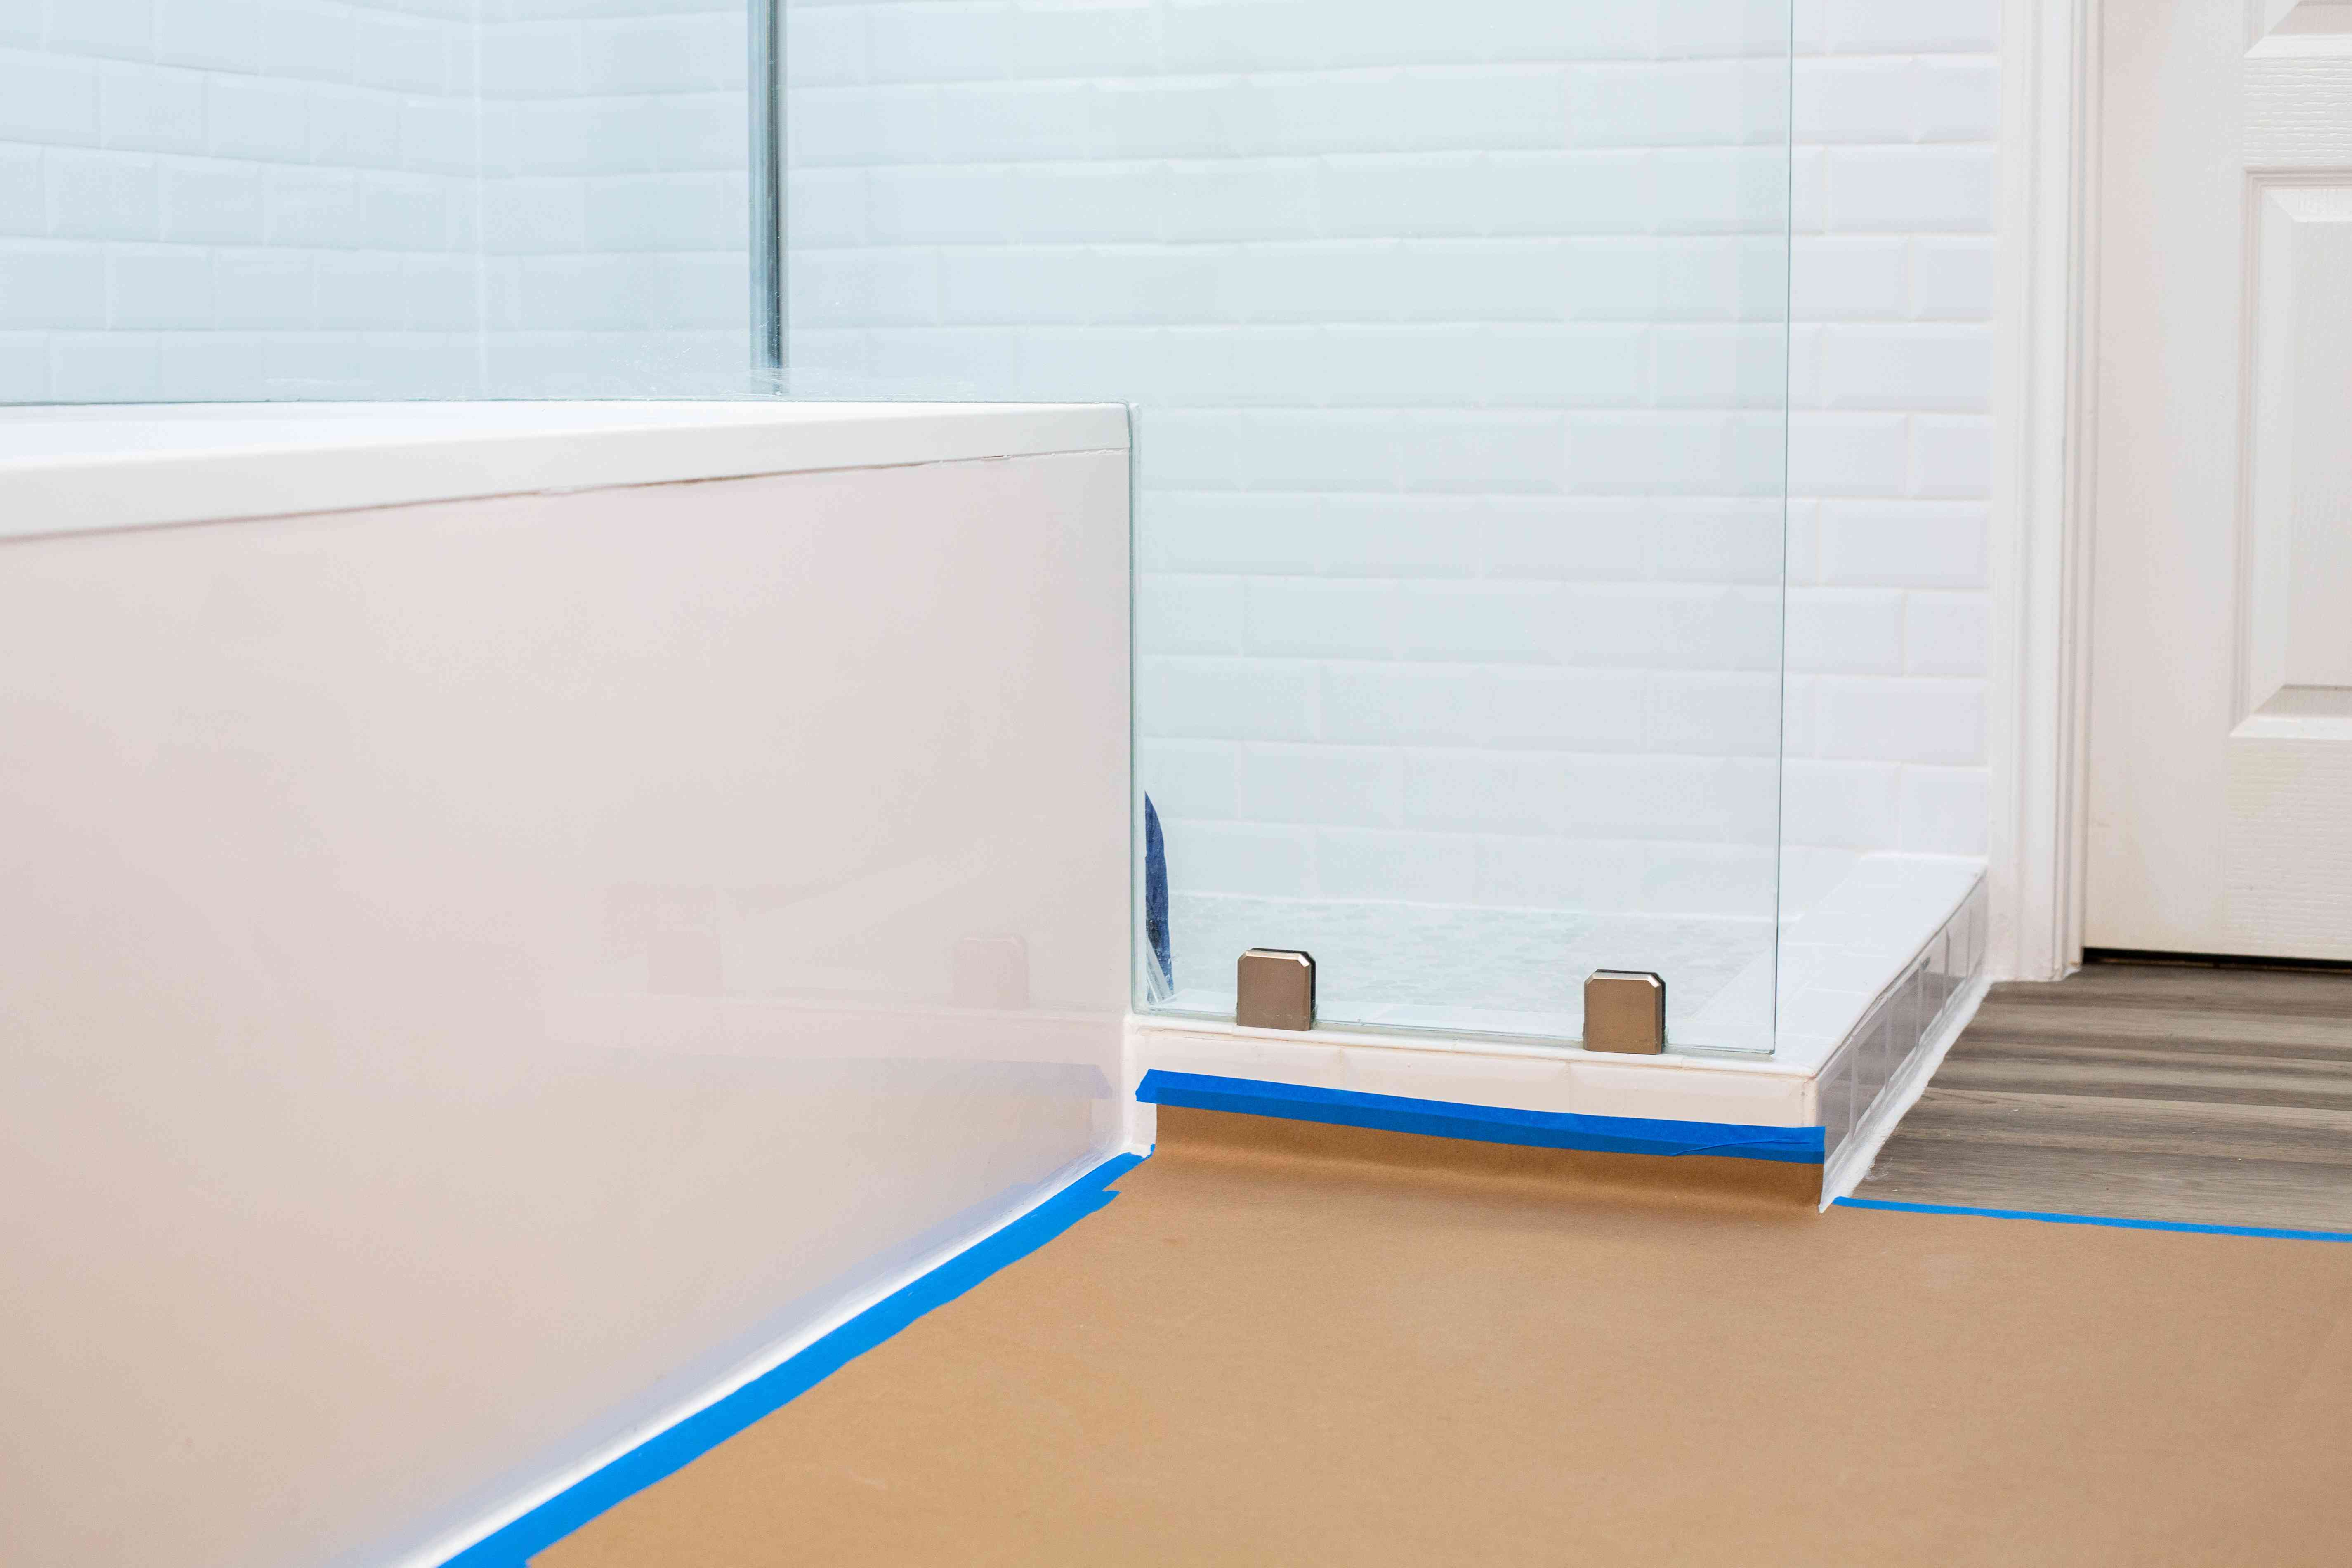 Blue tape and kraft paper masking floor areas in bathroom